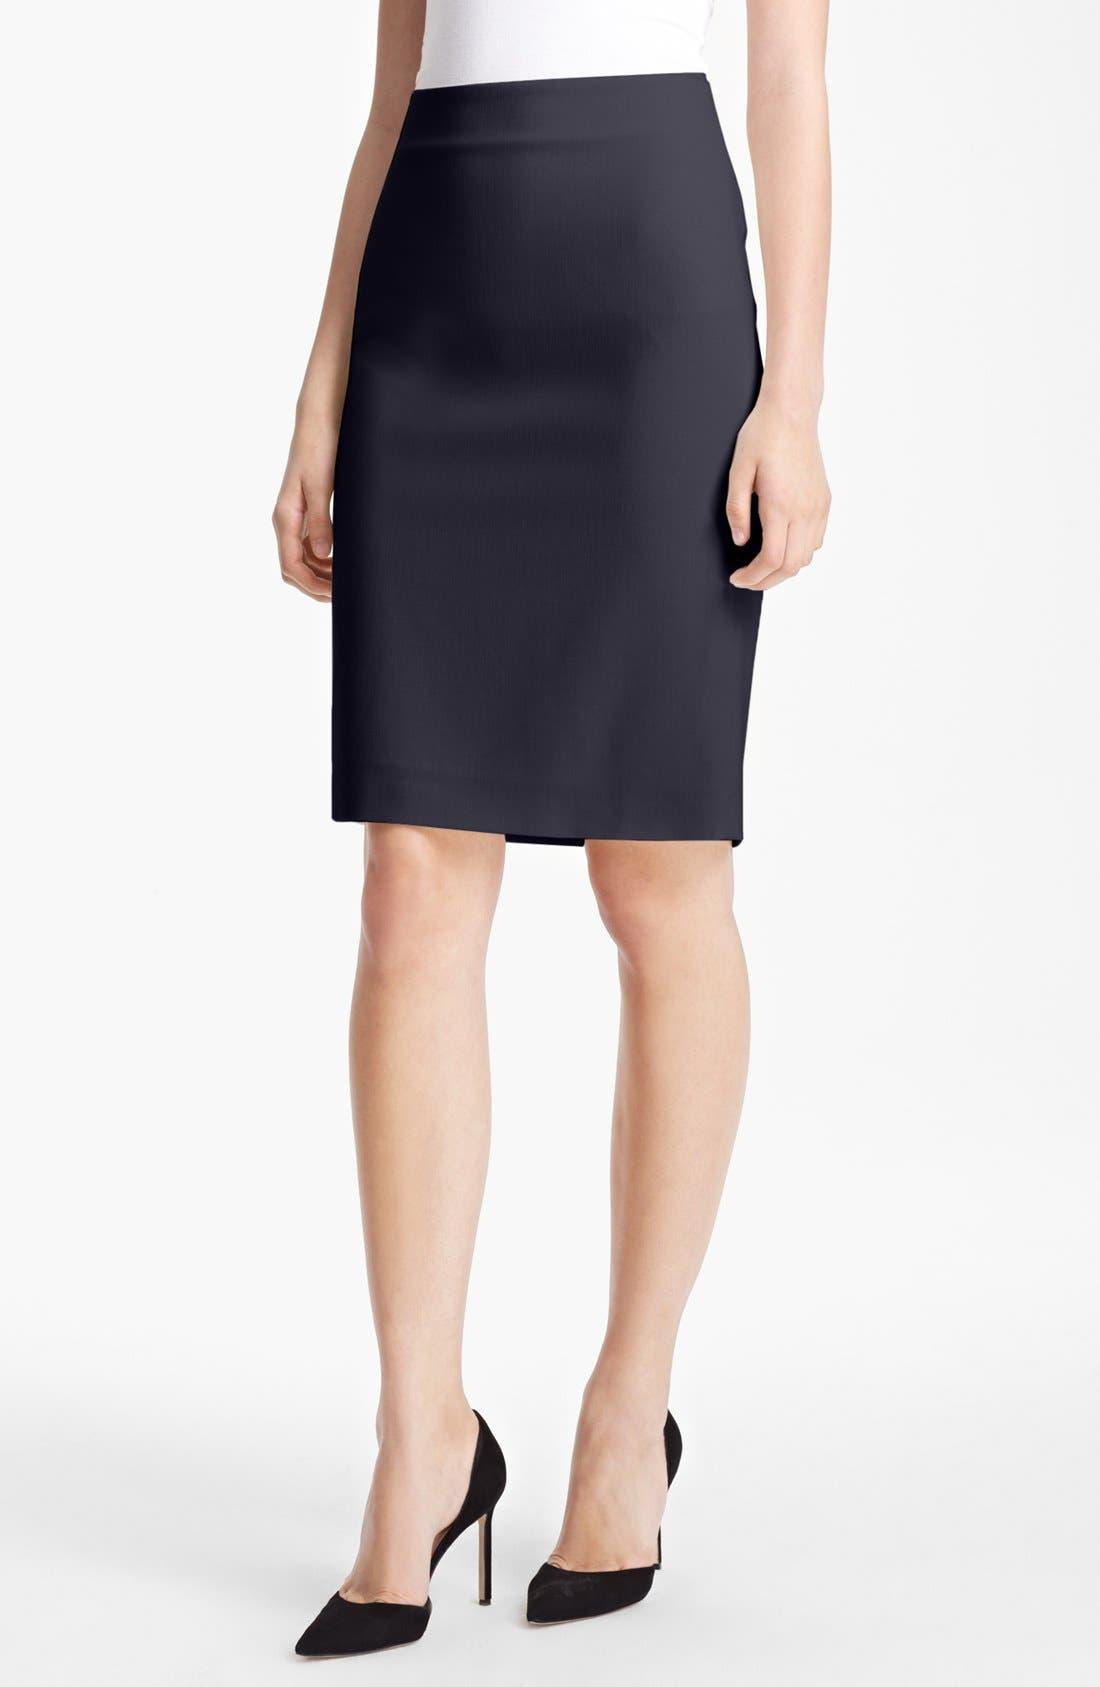 Main Image - Max Mara 'Tebano' Stretch Wool Pencil Skirt